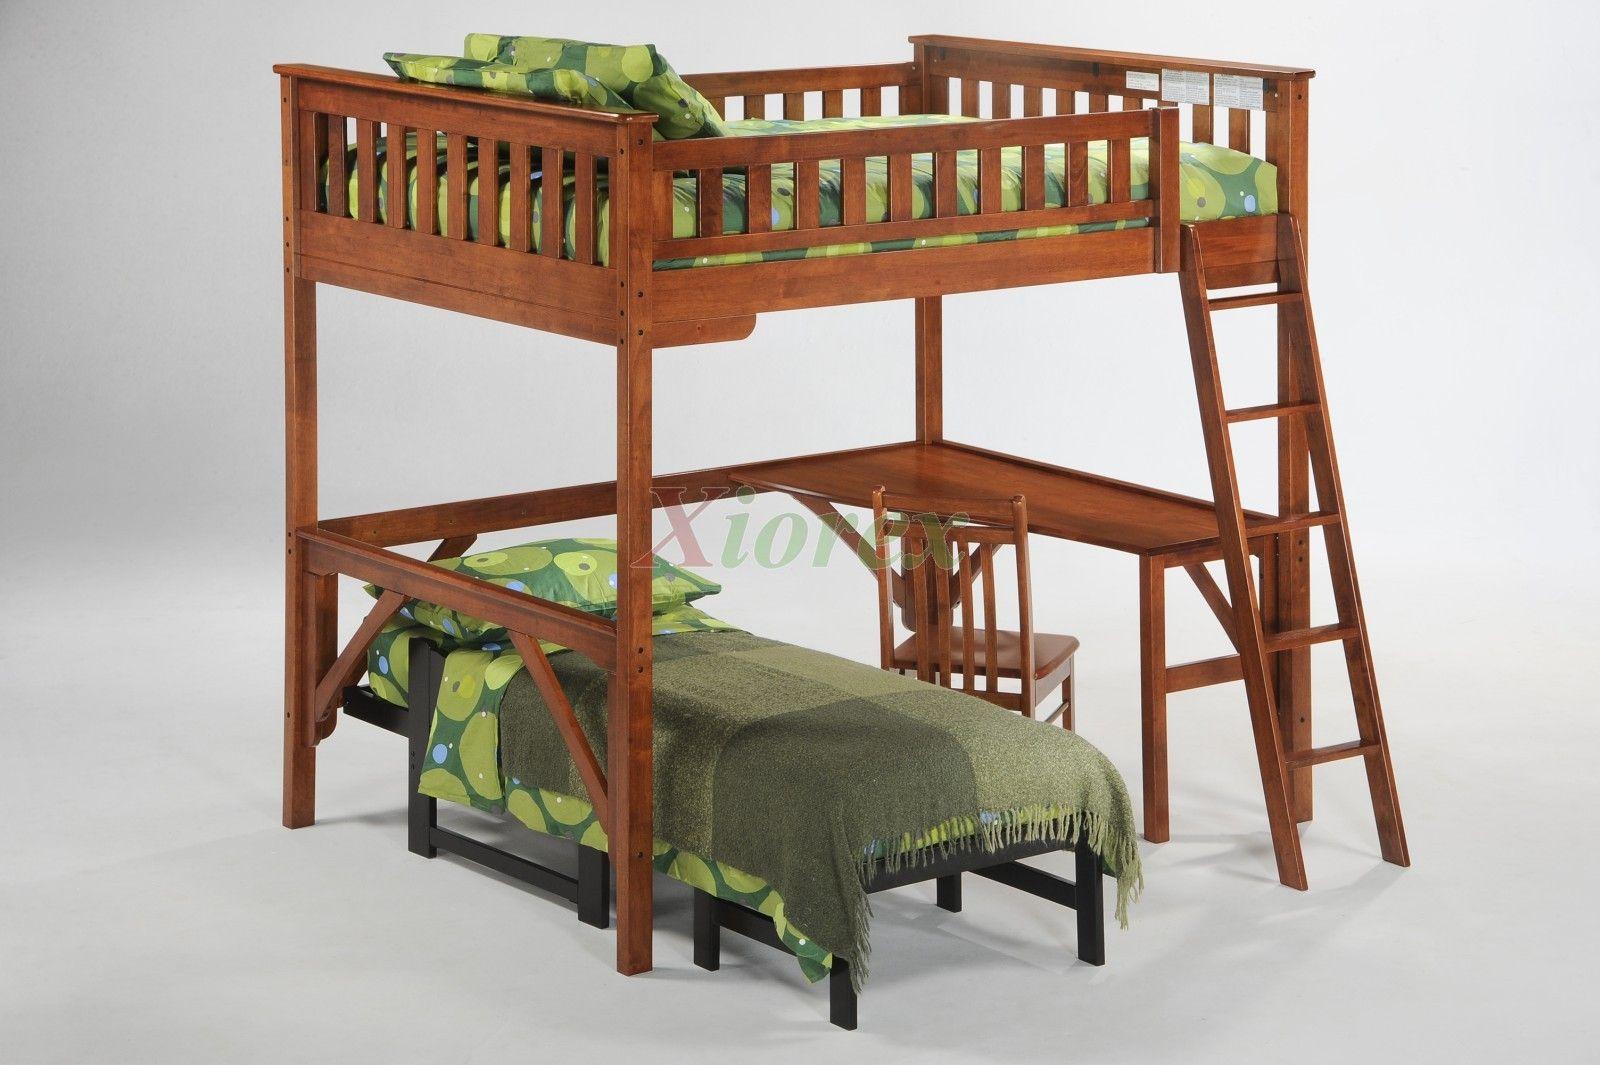 full loft bed bunk ginger loft bed w curvy desk student chair  u0026 futon ginger loft full loft bed bunk ginger loft bed w curvy desk student chair      rh   pinterest